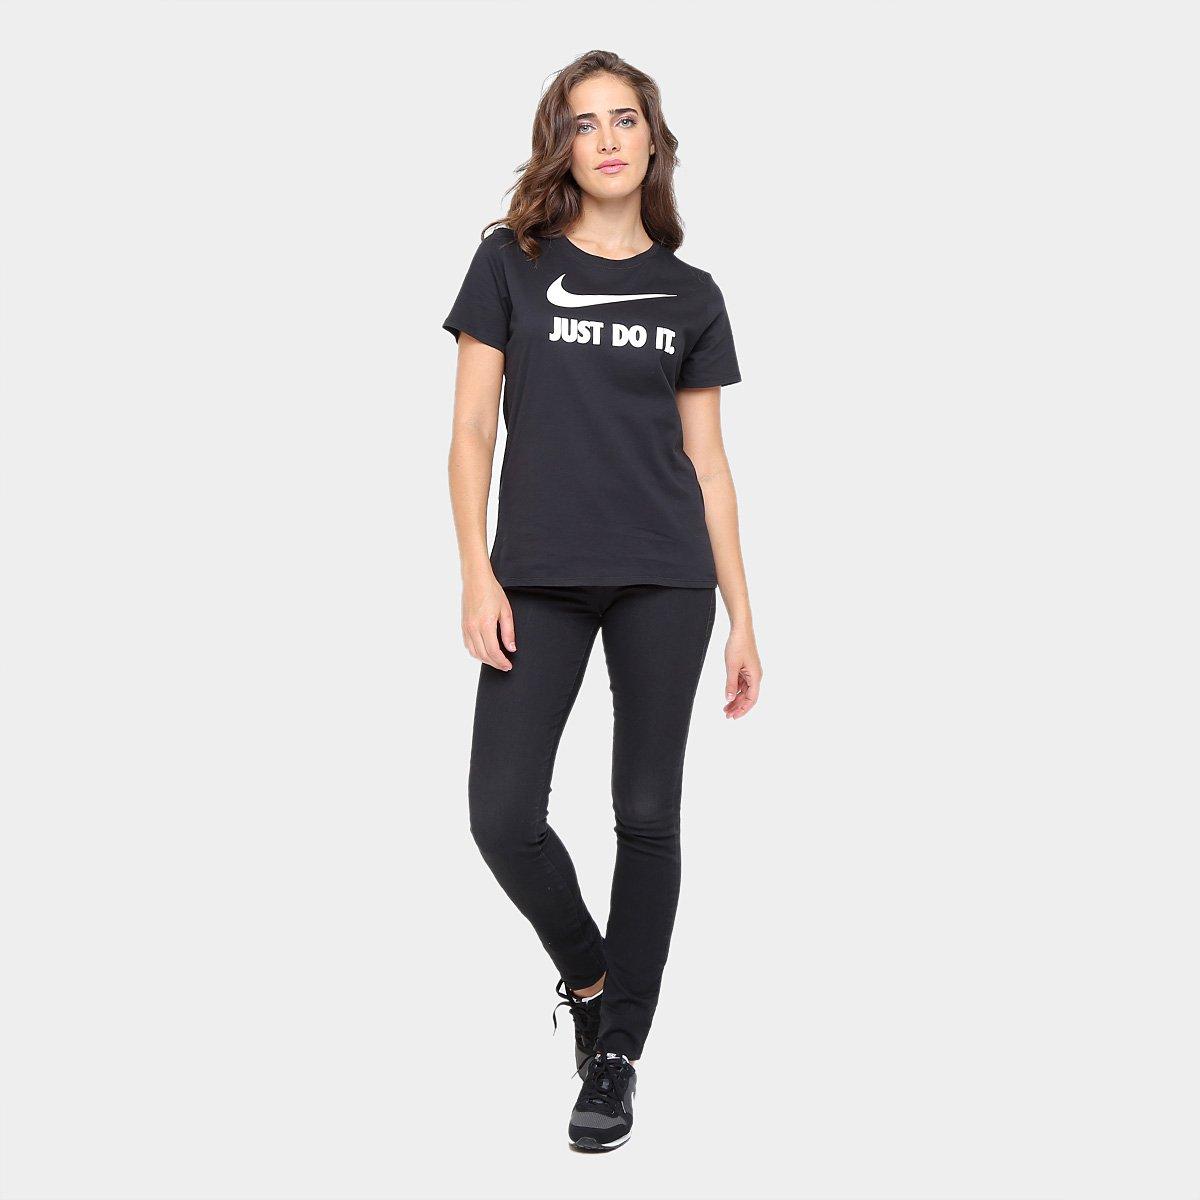 6728eafa78 Camiseta Nike Crew Jdi Swsh Hbr Feminina - Compre Agora